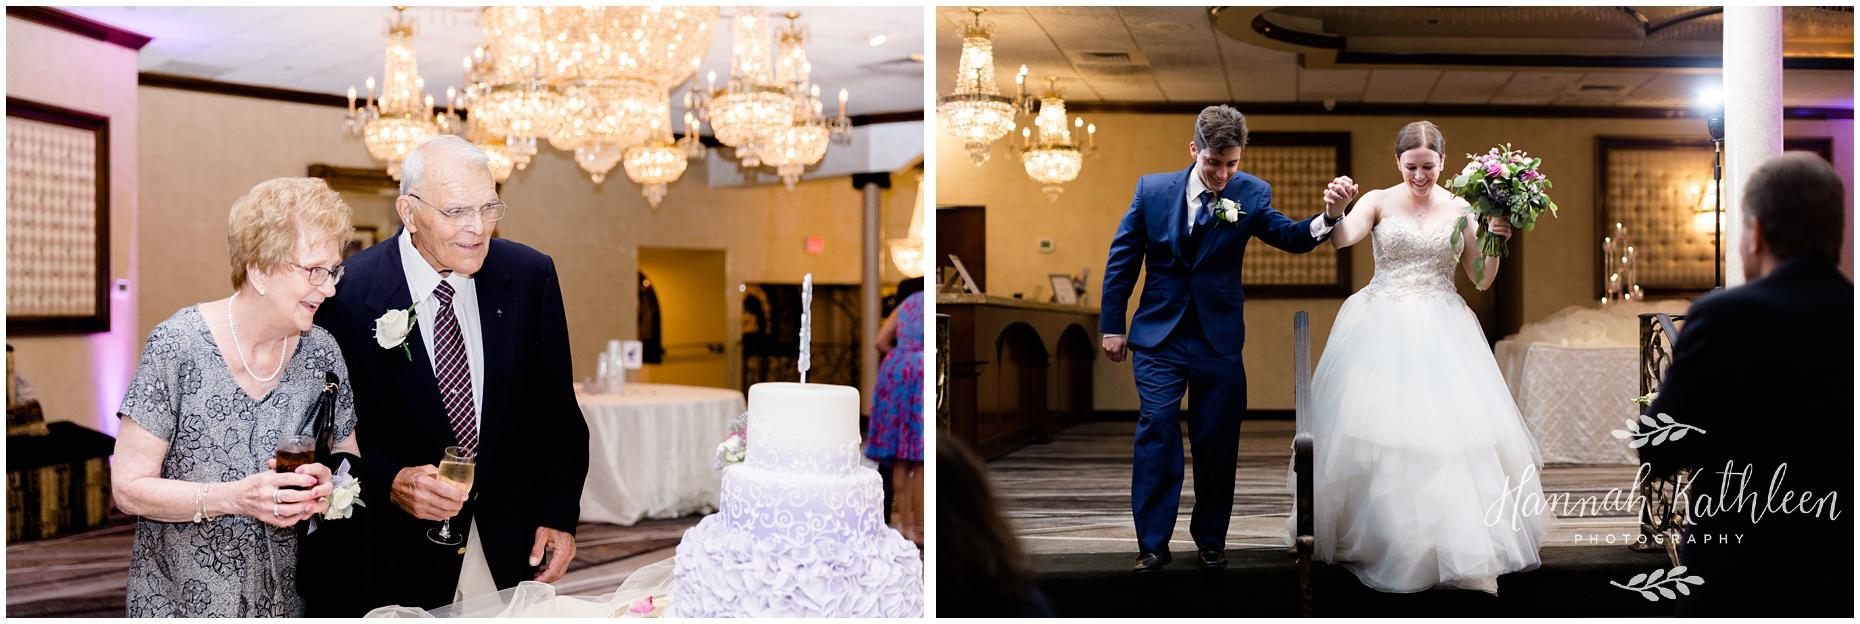 salvatores-hospitality-banquet-lancaster-williamsville-clarence-buffalo-new-york-wny-wedding-bride-groom-photographer